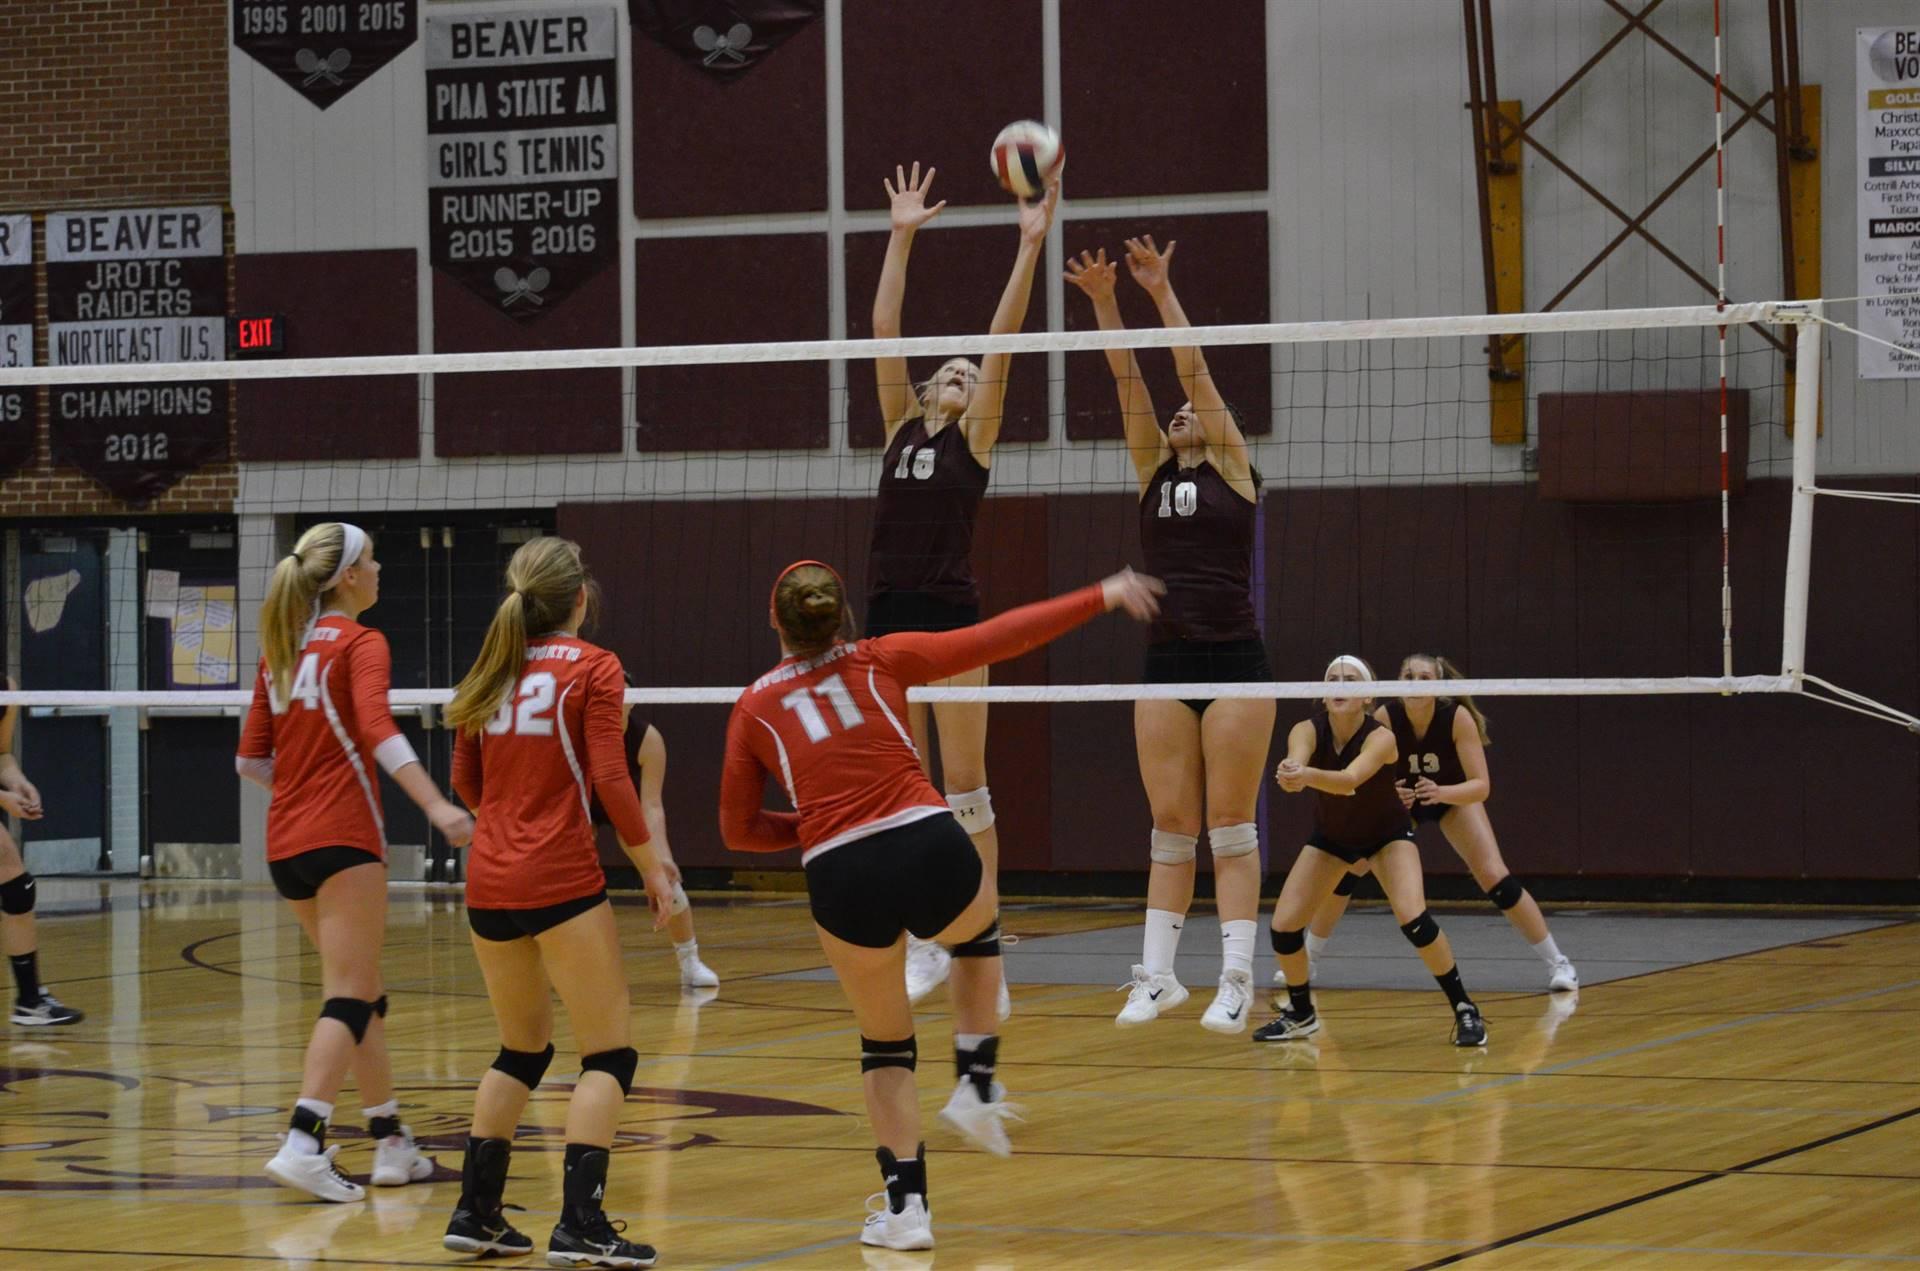 Varsity girl's volleyball - Blocking the shot!